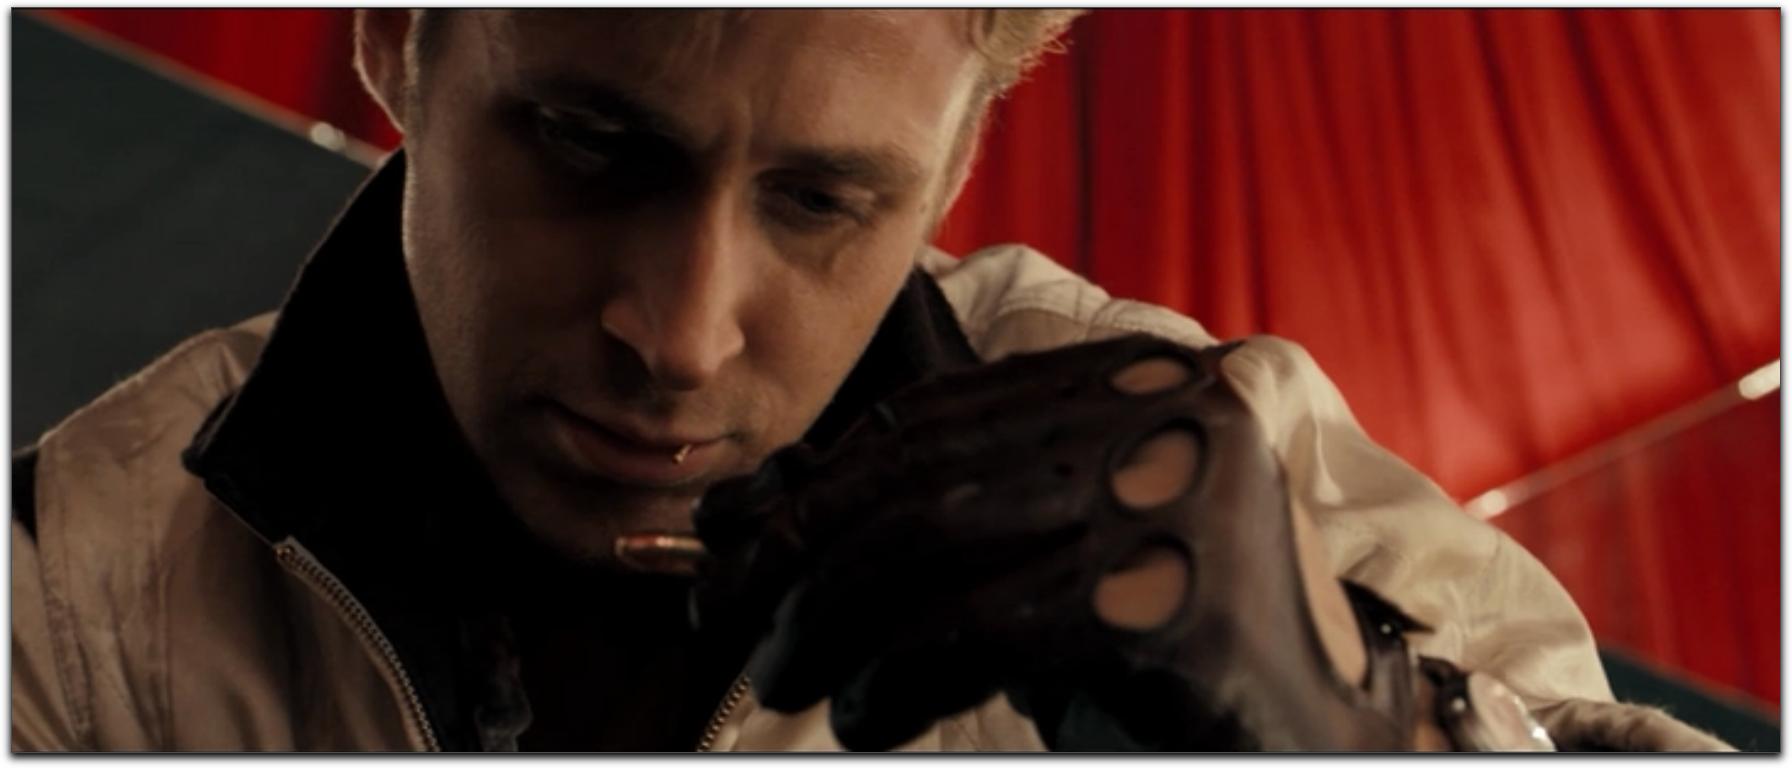 Ryan Gosling Drive Driving Gloves